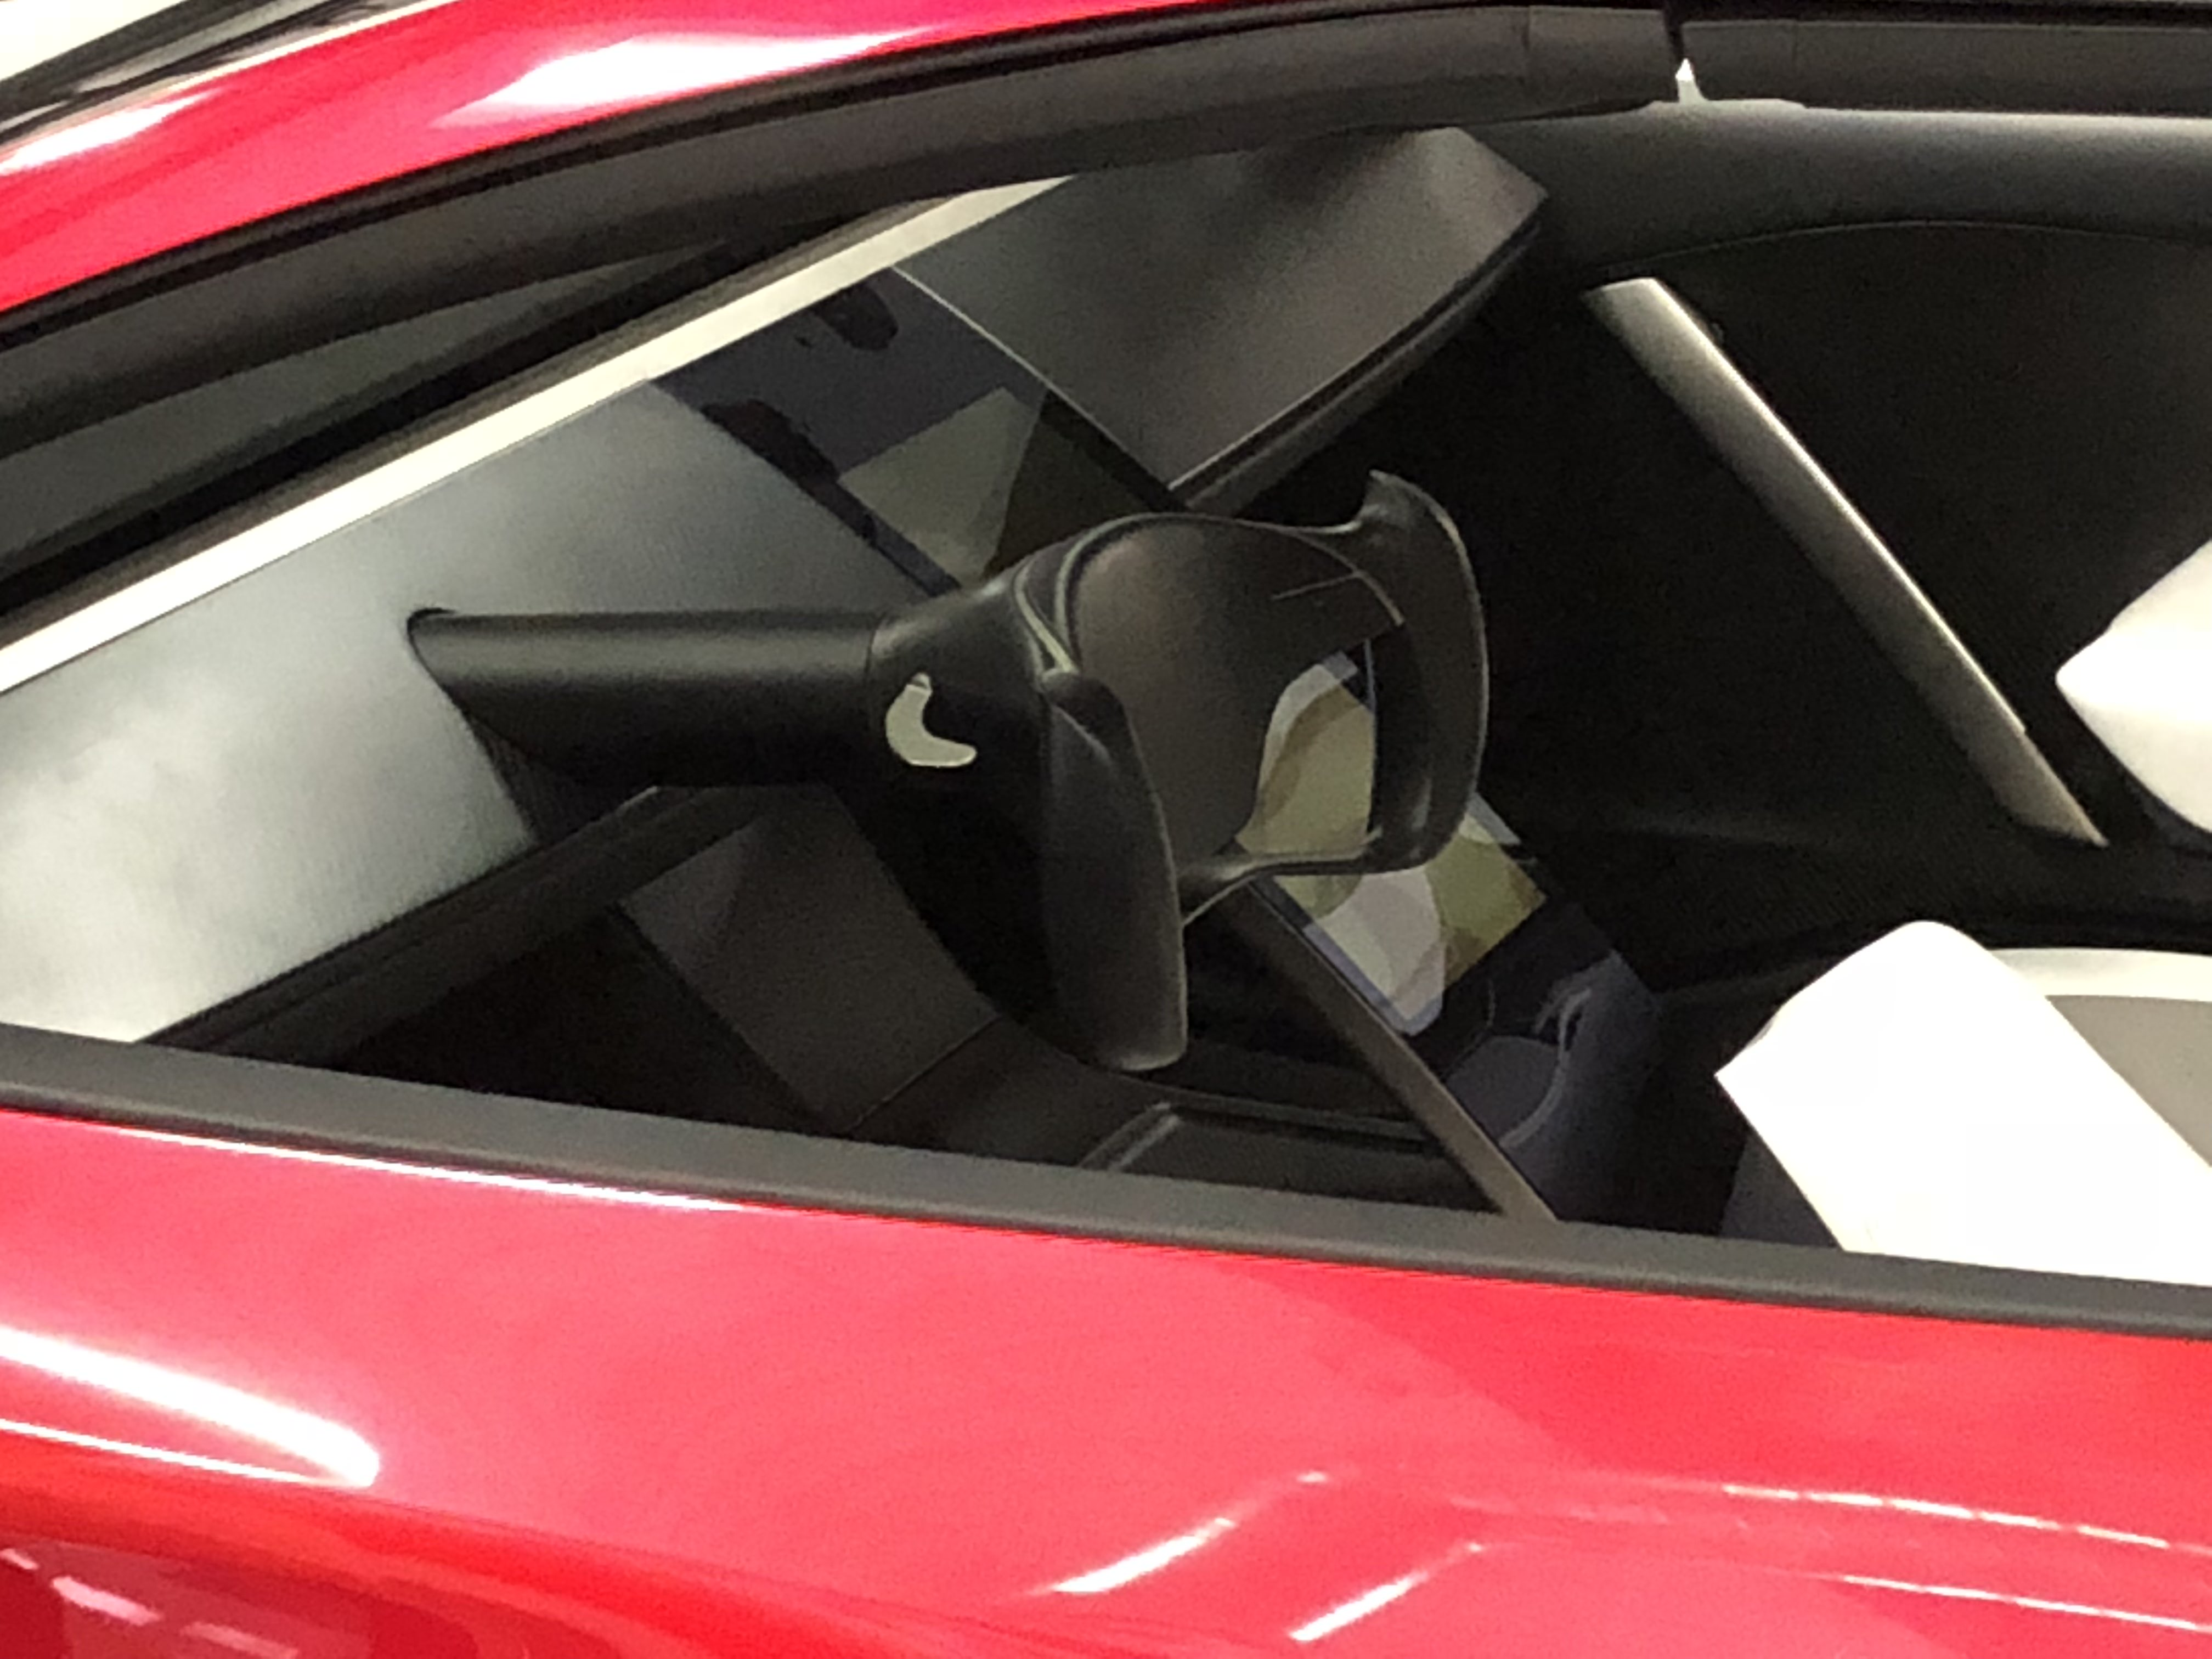 red-tesla-roadster-palo-alto-hq-11